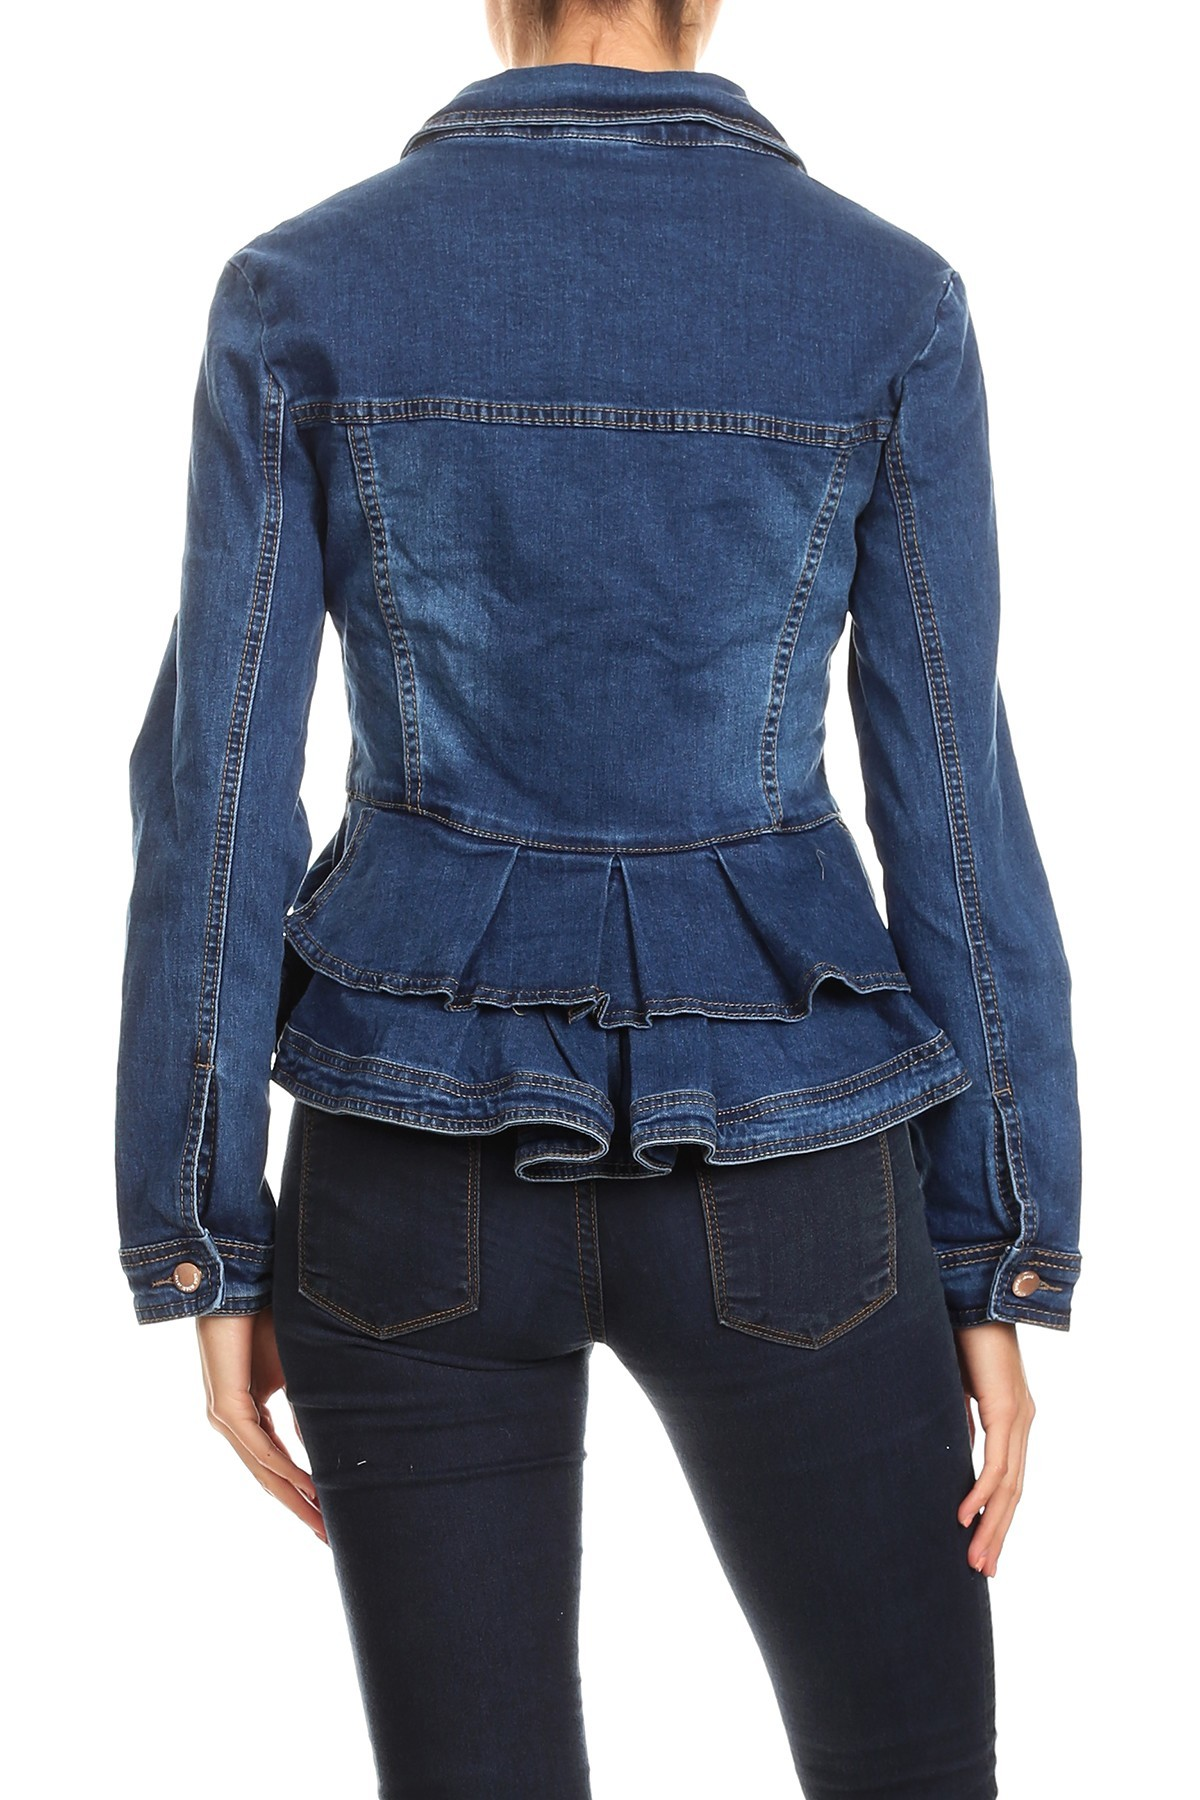 Women-039-s-Juniors-Premium-Denim-Peplum-Bodice-Long-Sleeve-Jacket thumbnail 10